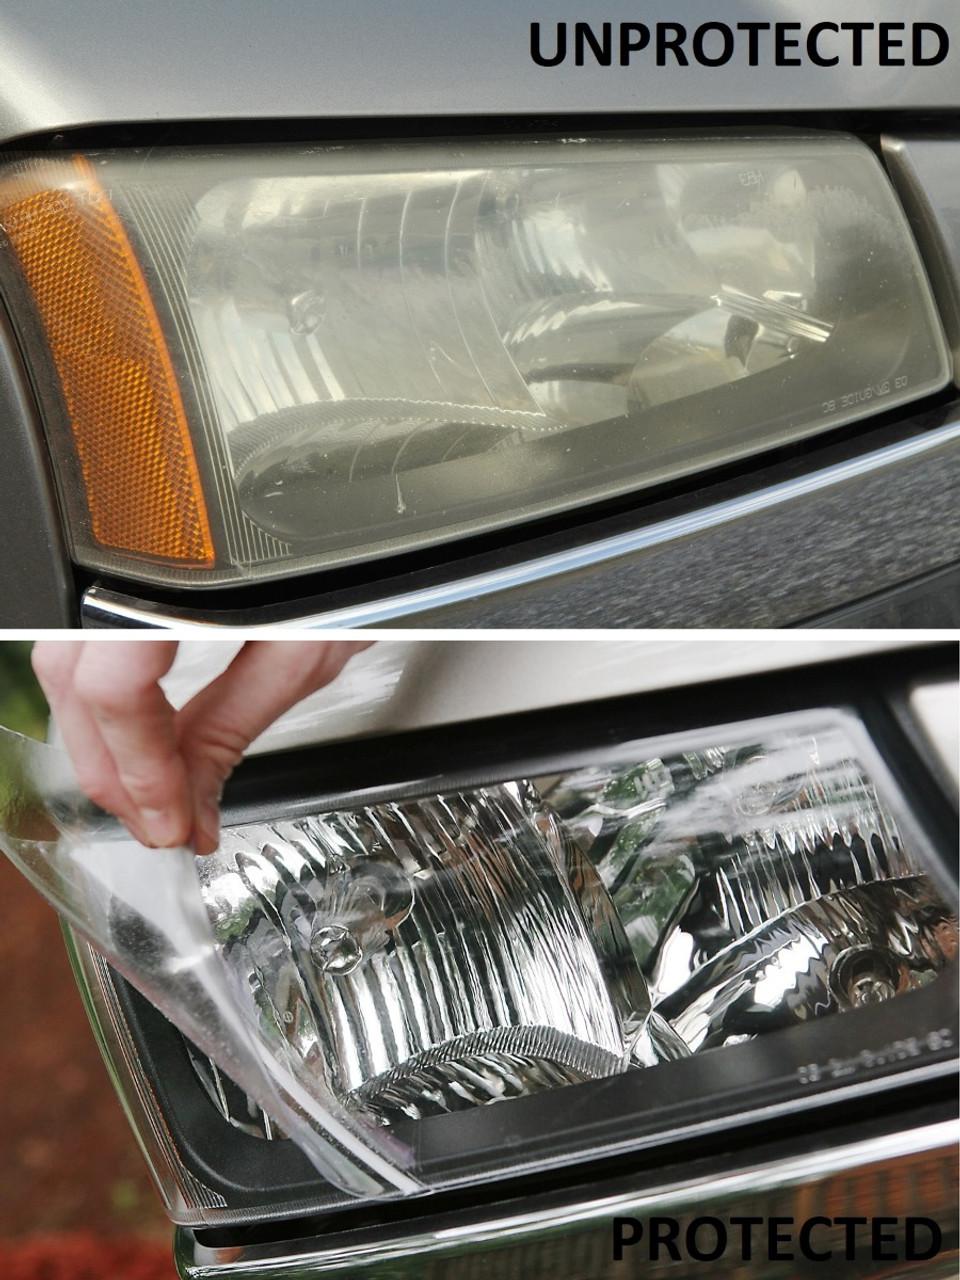 2004 Jeep Liberty Headlights : liberty, headlights, Liberty, (02-04), Headlight, Light, Covers